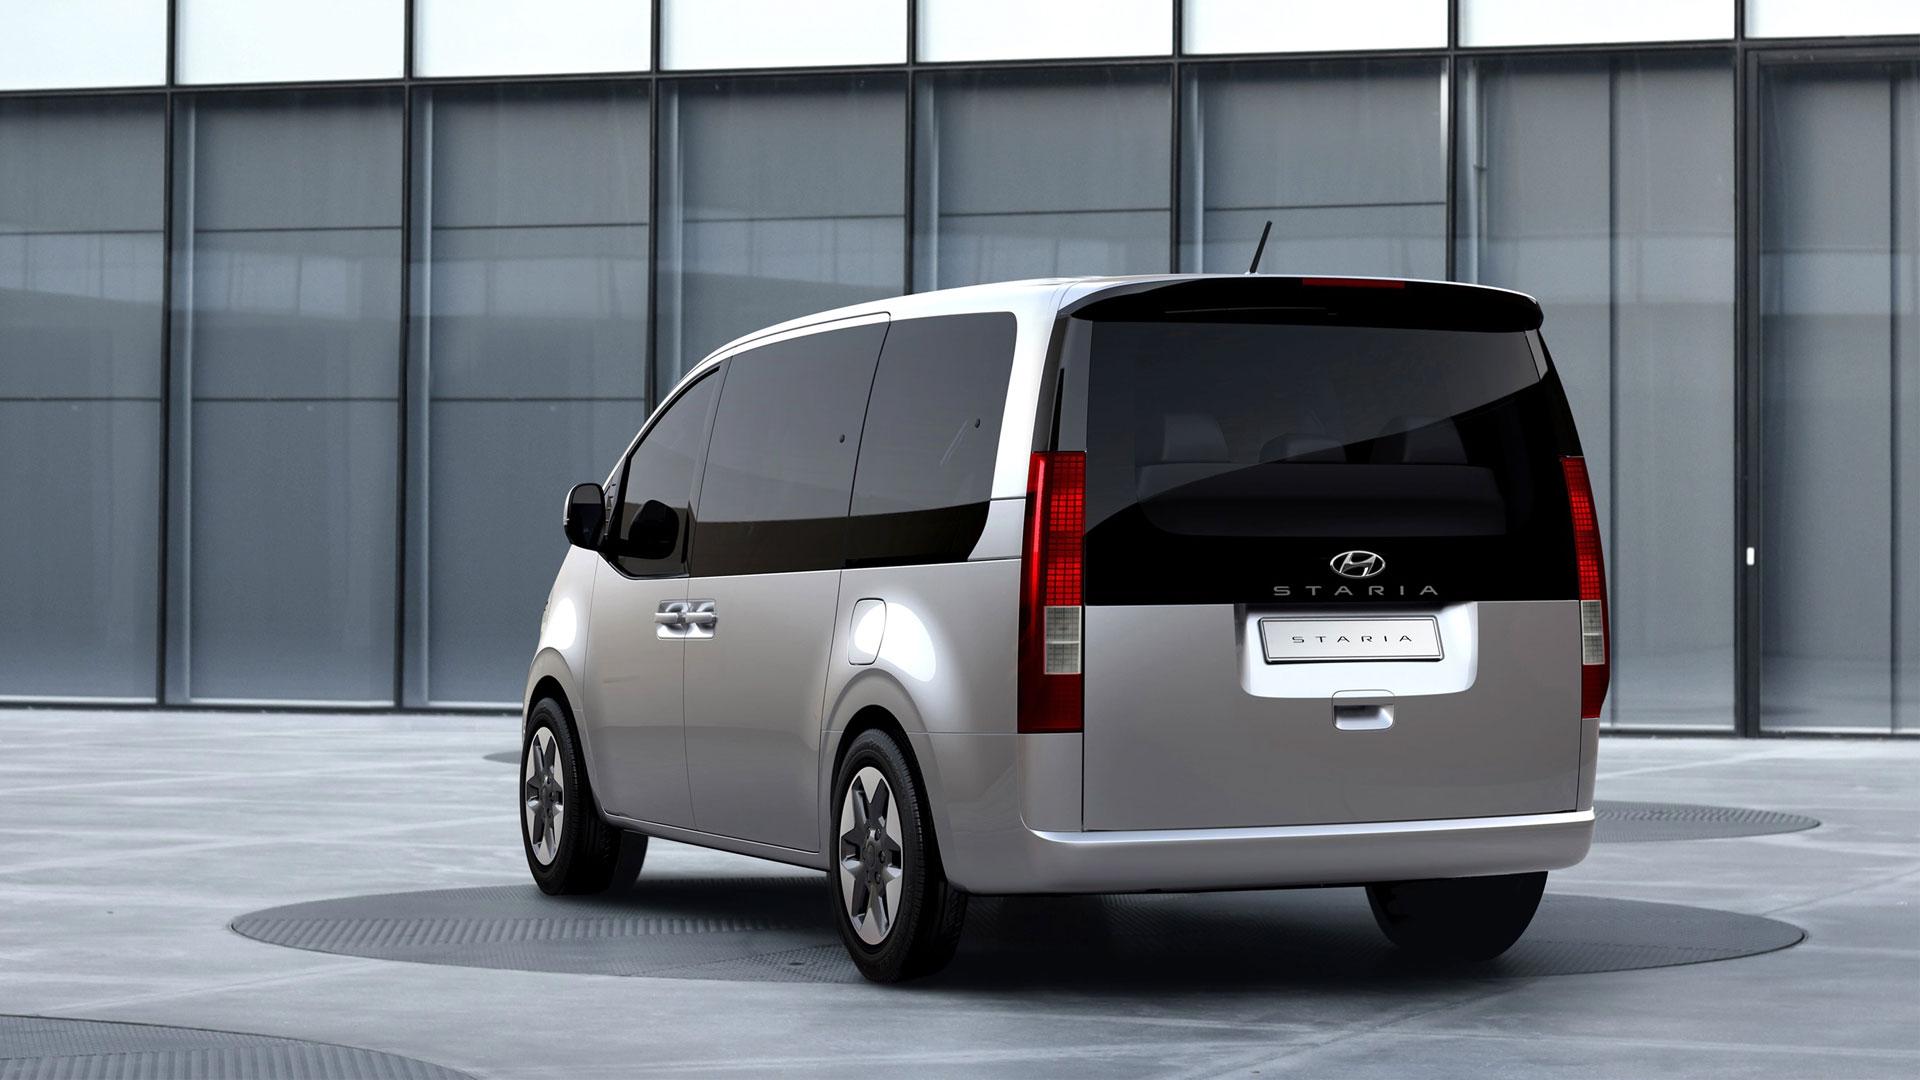 The Hyundai Staria alternative rear view